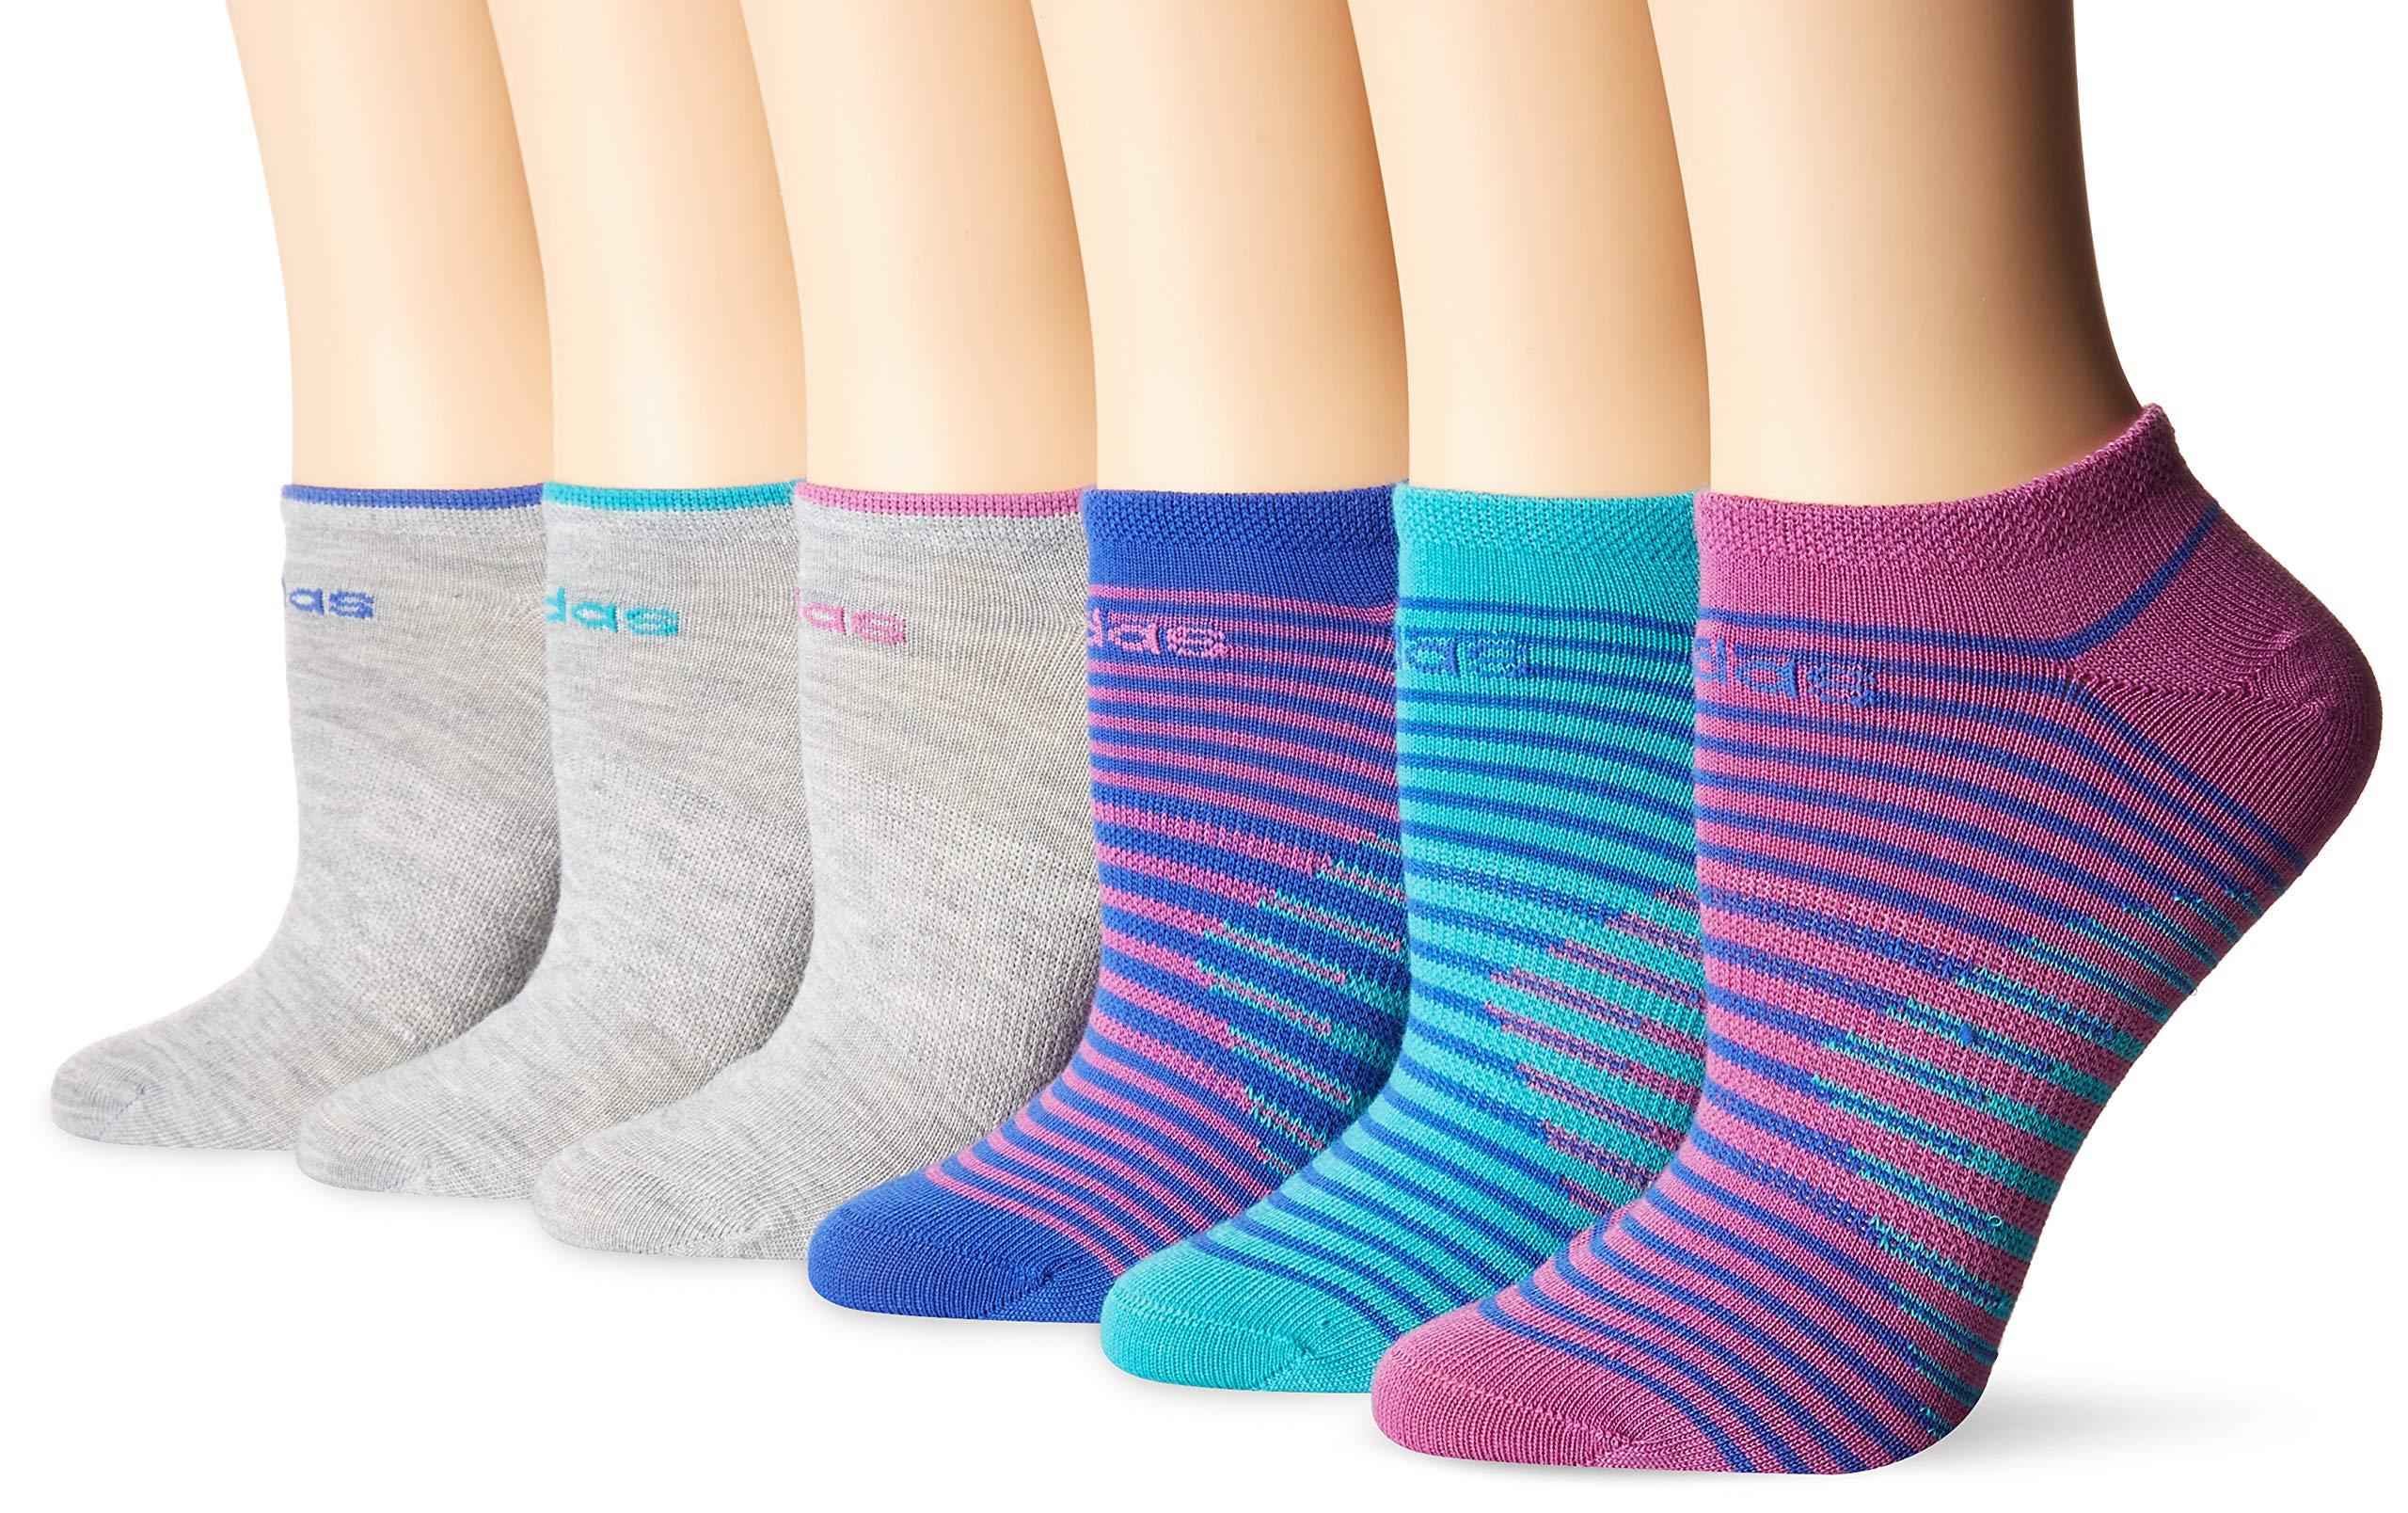 adidas Youth Kids-Girl's Superlite No Show Socks (6 Pair), Hi - Res Aqua Green/Hi - Res Blue/Joy Orchid Pink/Ligh, Medium, (Shoe Size 13C-4Y) by adidas